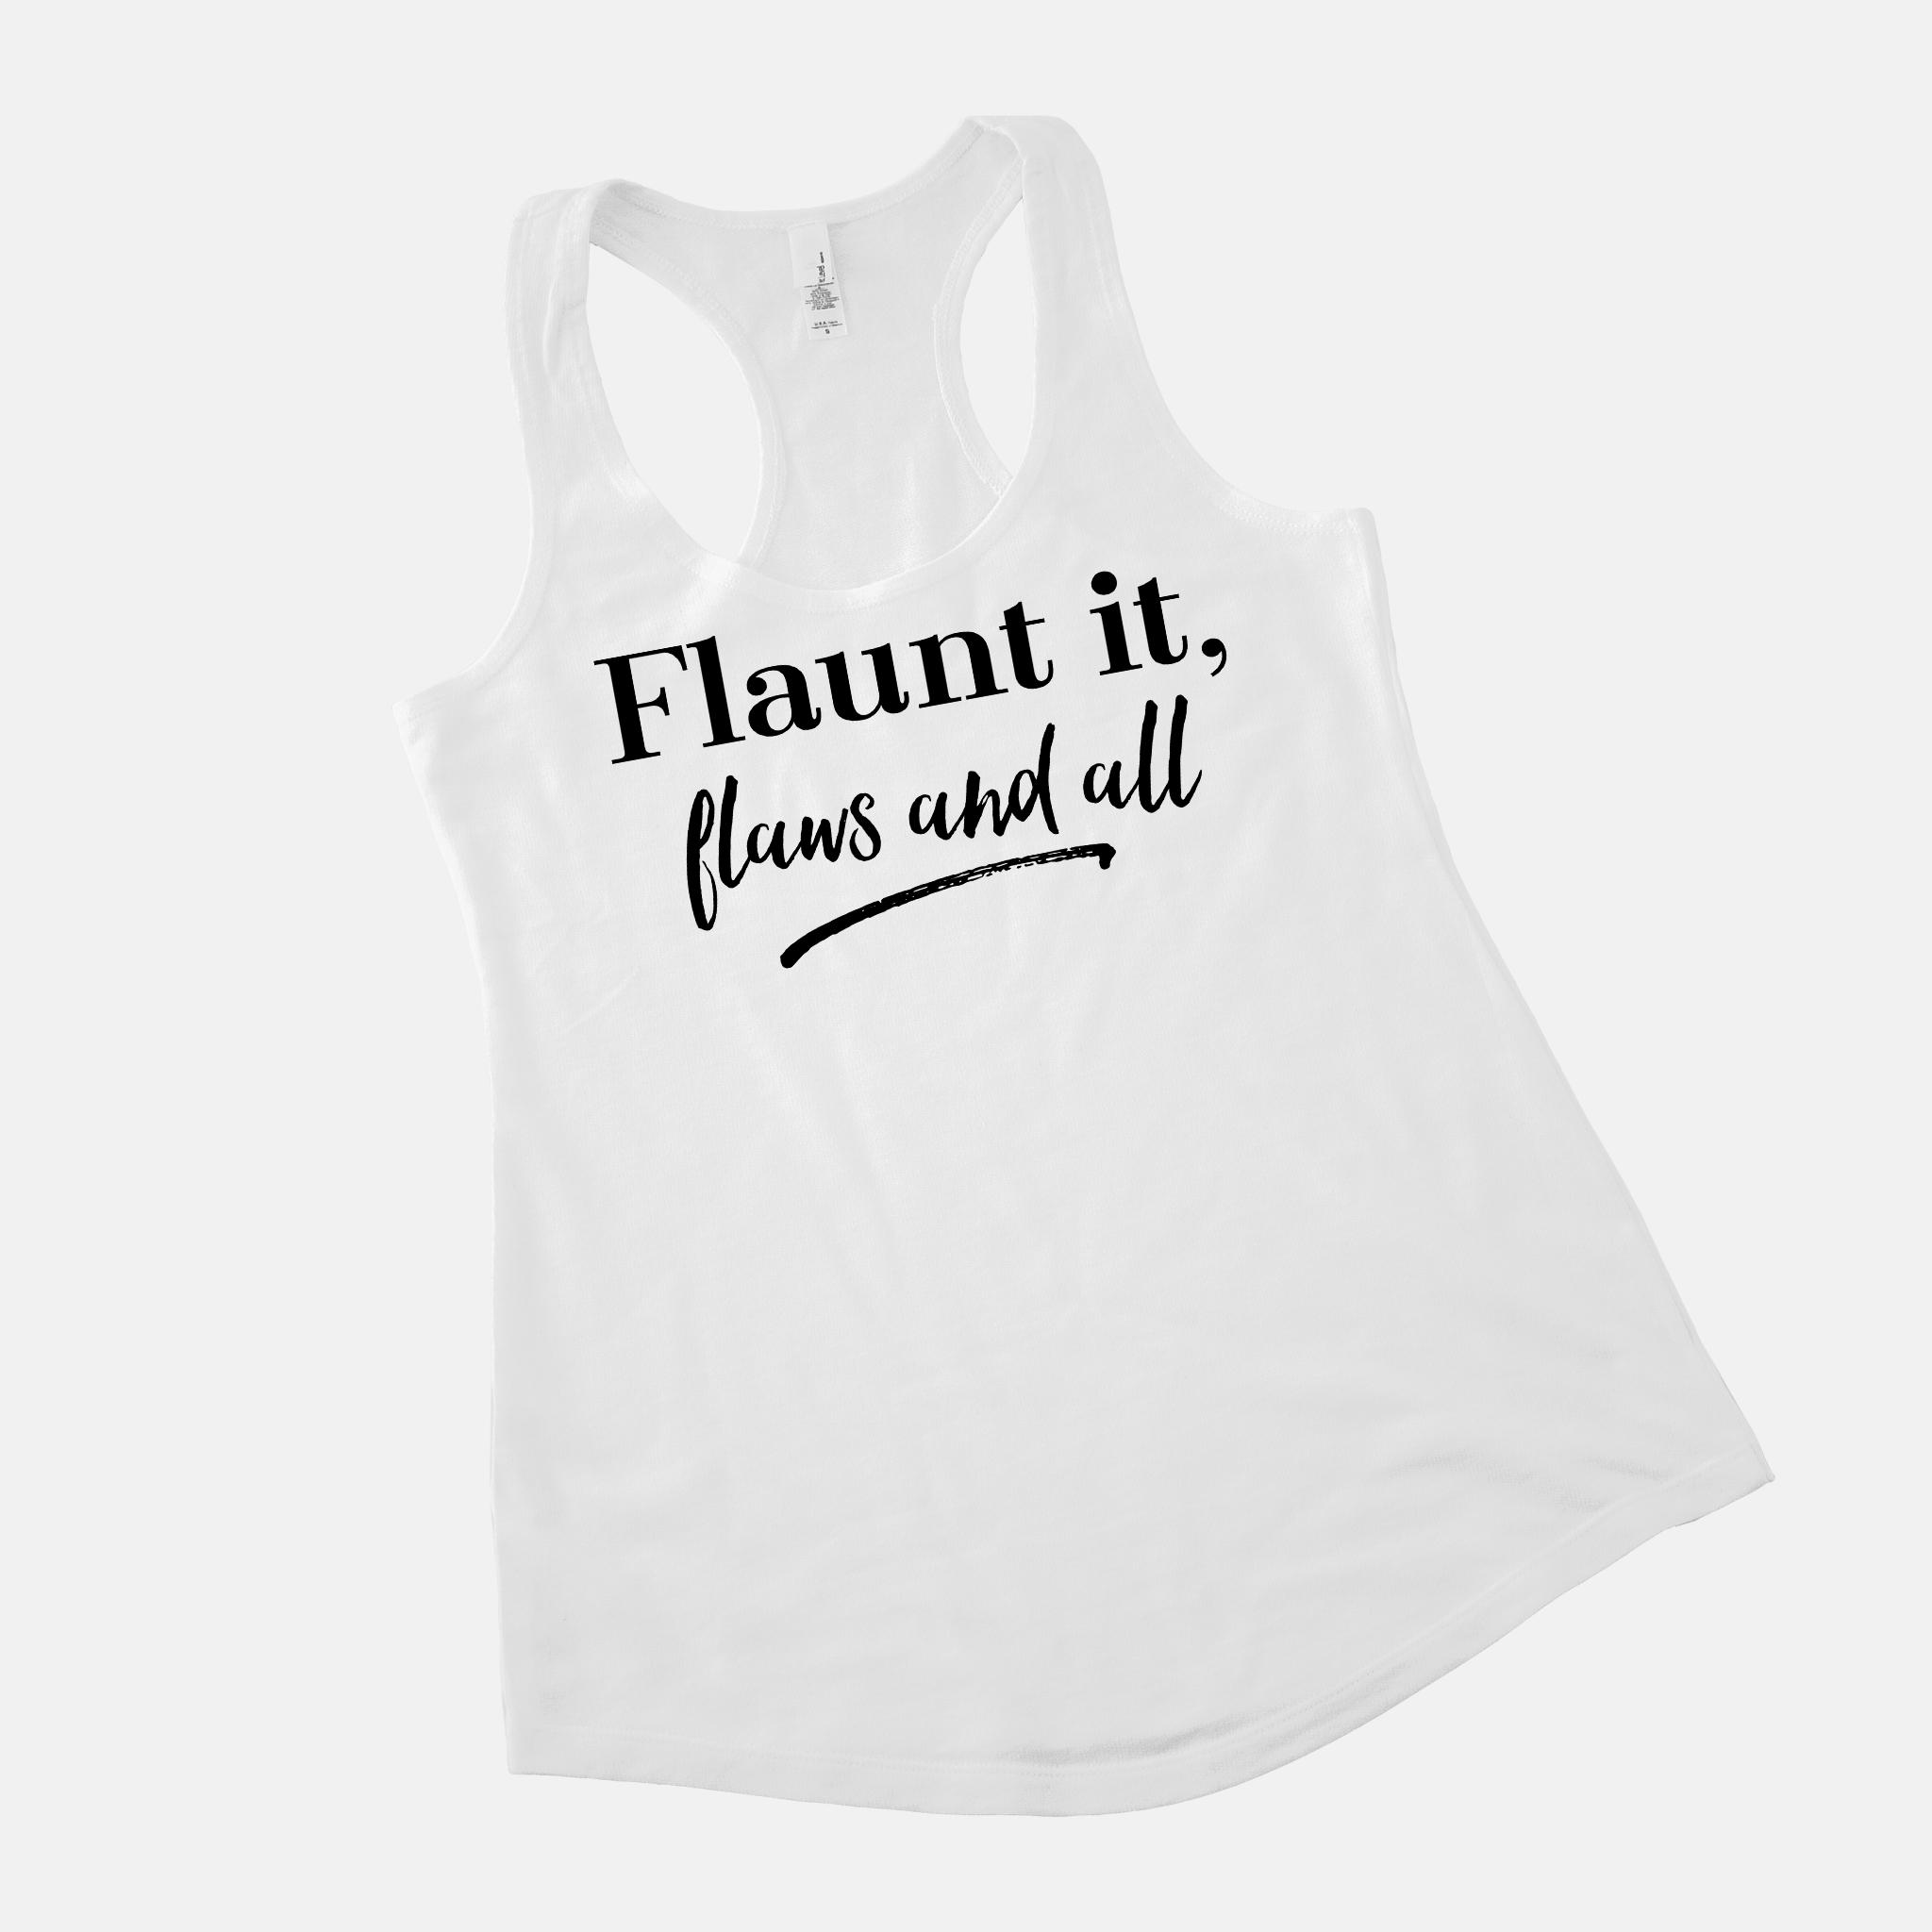 Flaunt It Tank Top 4.png